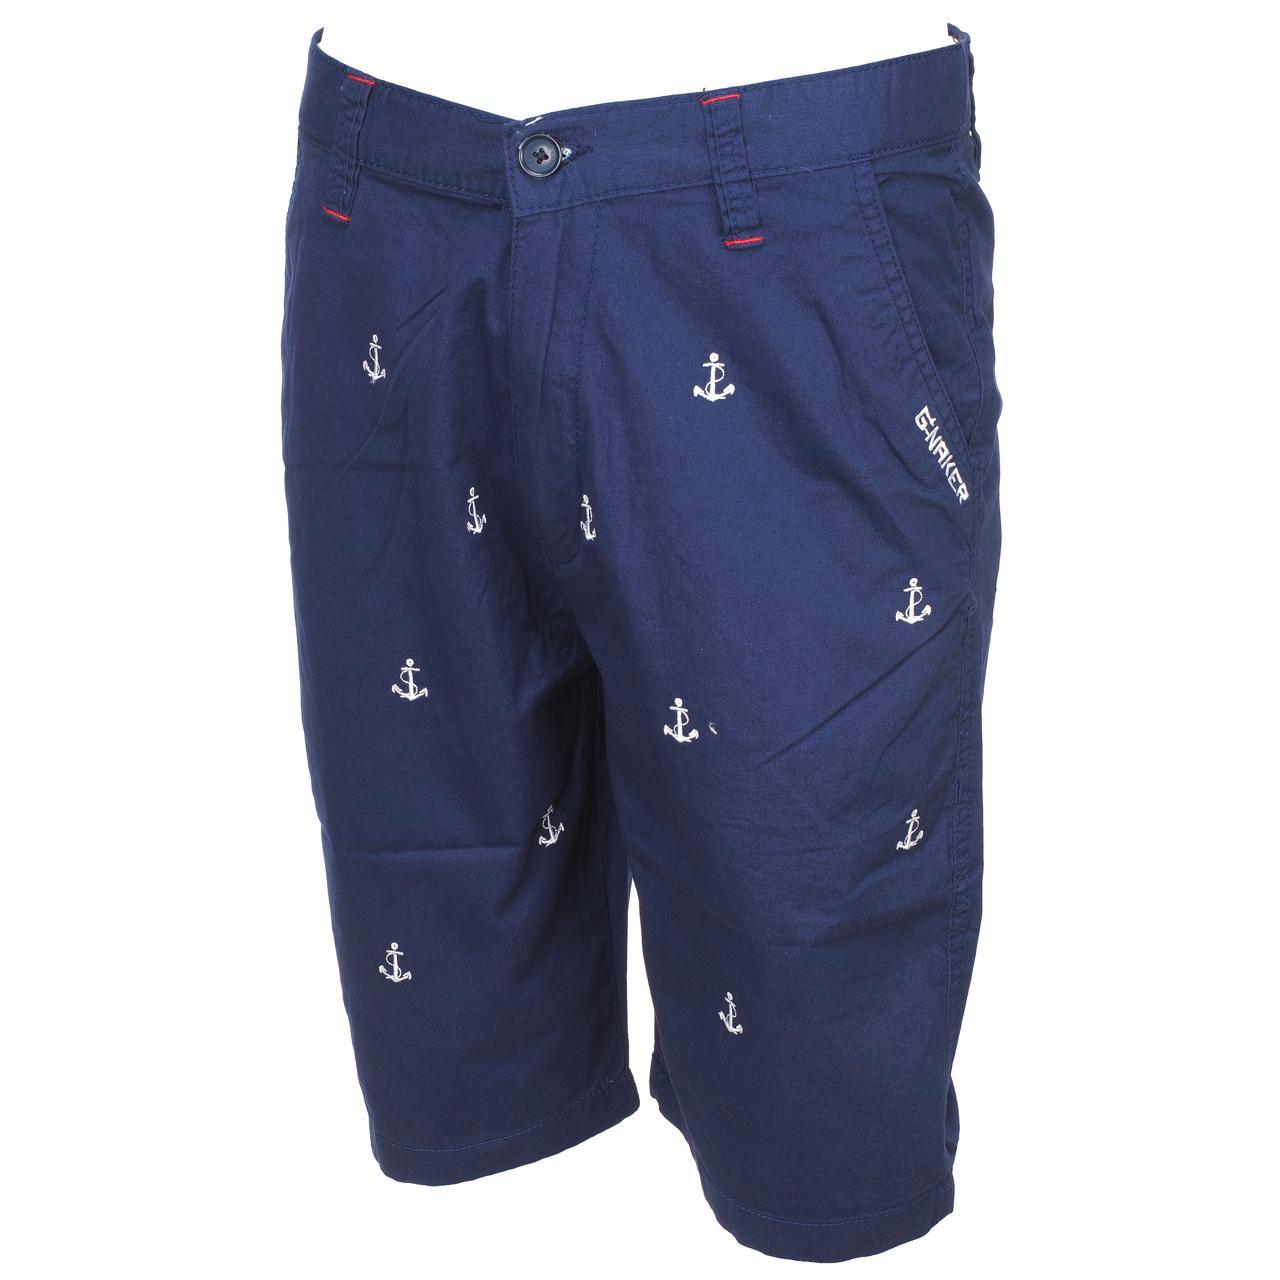 Bermuda-Shorts-G-naker-Mirbel-Navy-Bermuda-Blue-53397-New